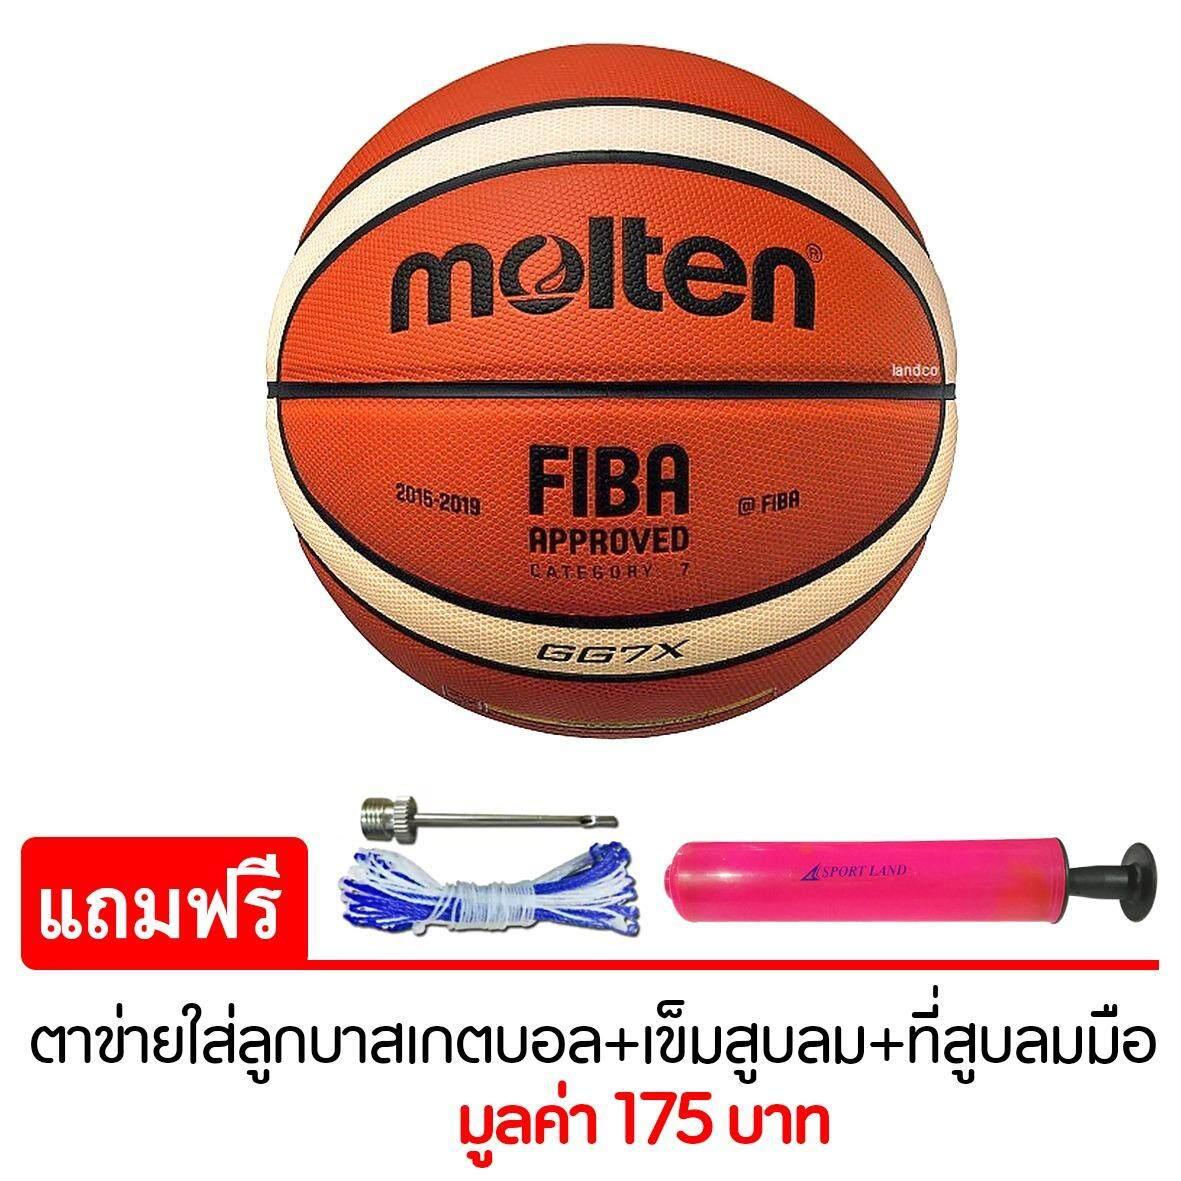 MOLTEN บาสเก็ตบอล หนังอัด มอลเทน Basketball PU MOLTEN BGG7X FIBA แถมฟรี ตาข่ายใส่ลูกบาสเกตบอล + เข็มสูบสูบลม + สูบมือ SPL รุ่น SL6 สีชมพู